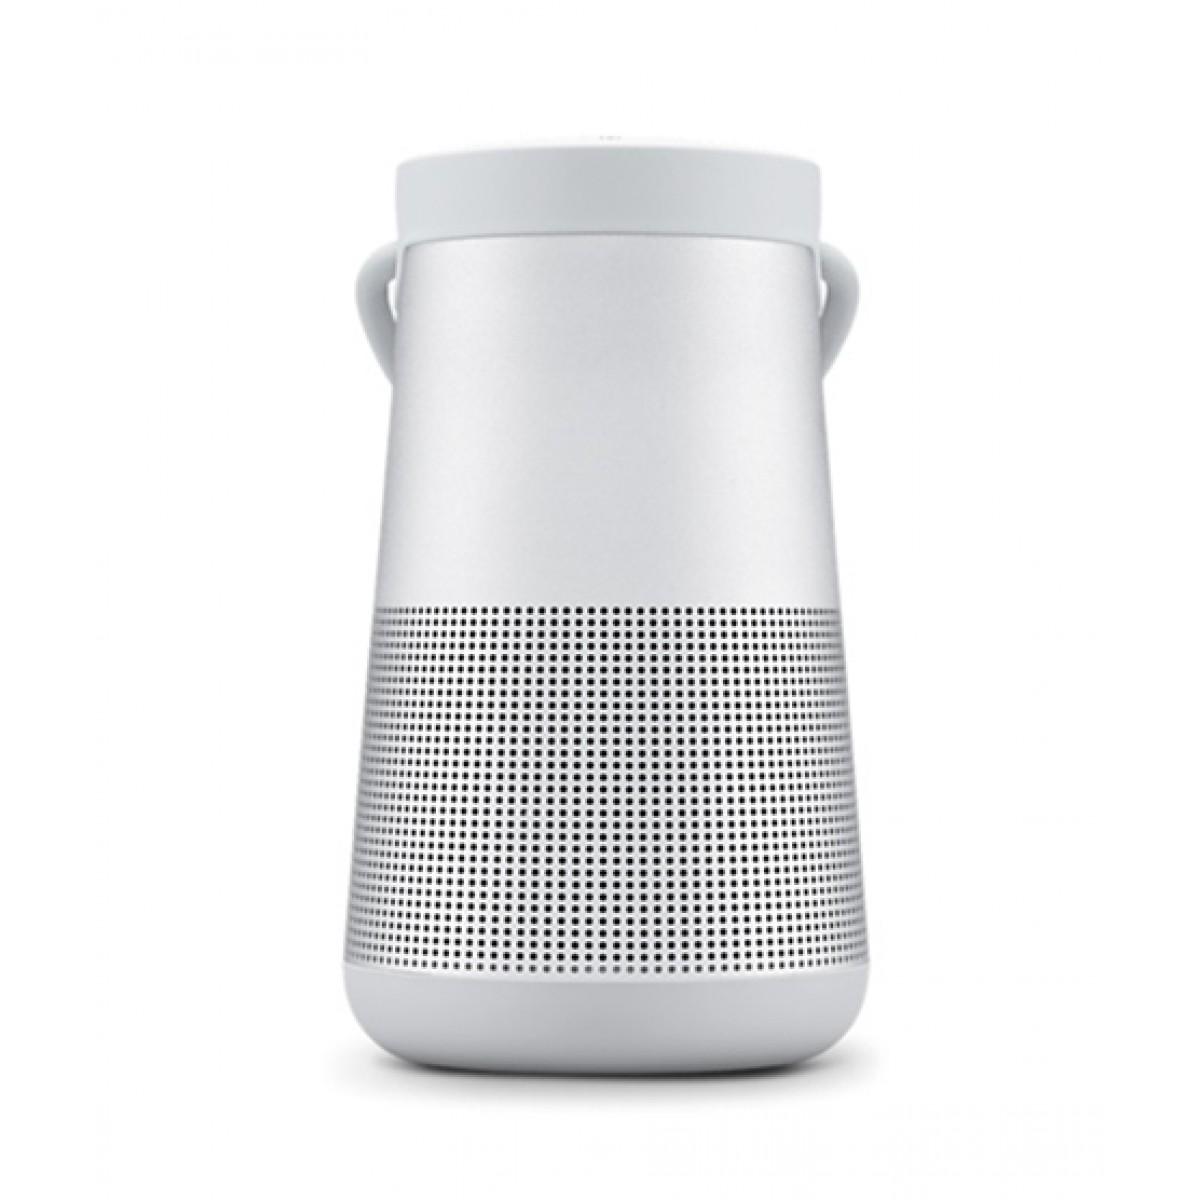 Bose SoundLink Revolve+ Bluetooth Speaker Lux Gray